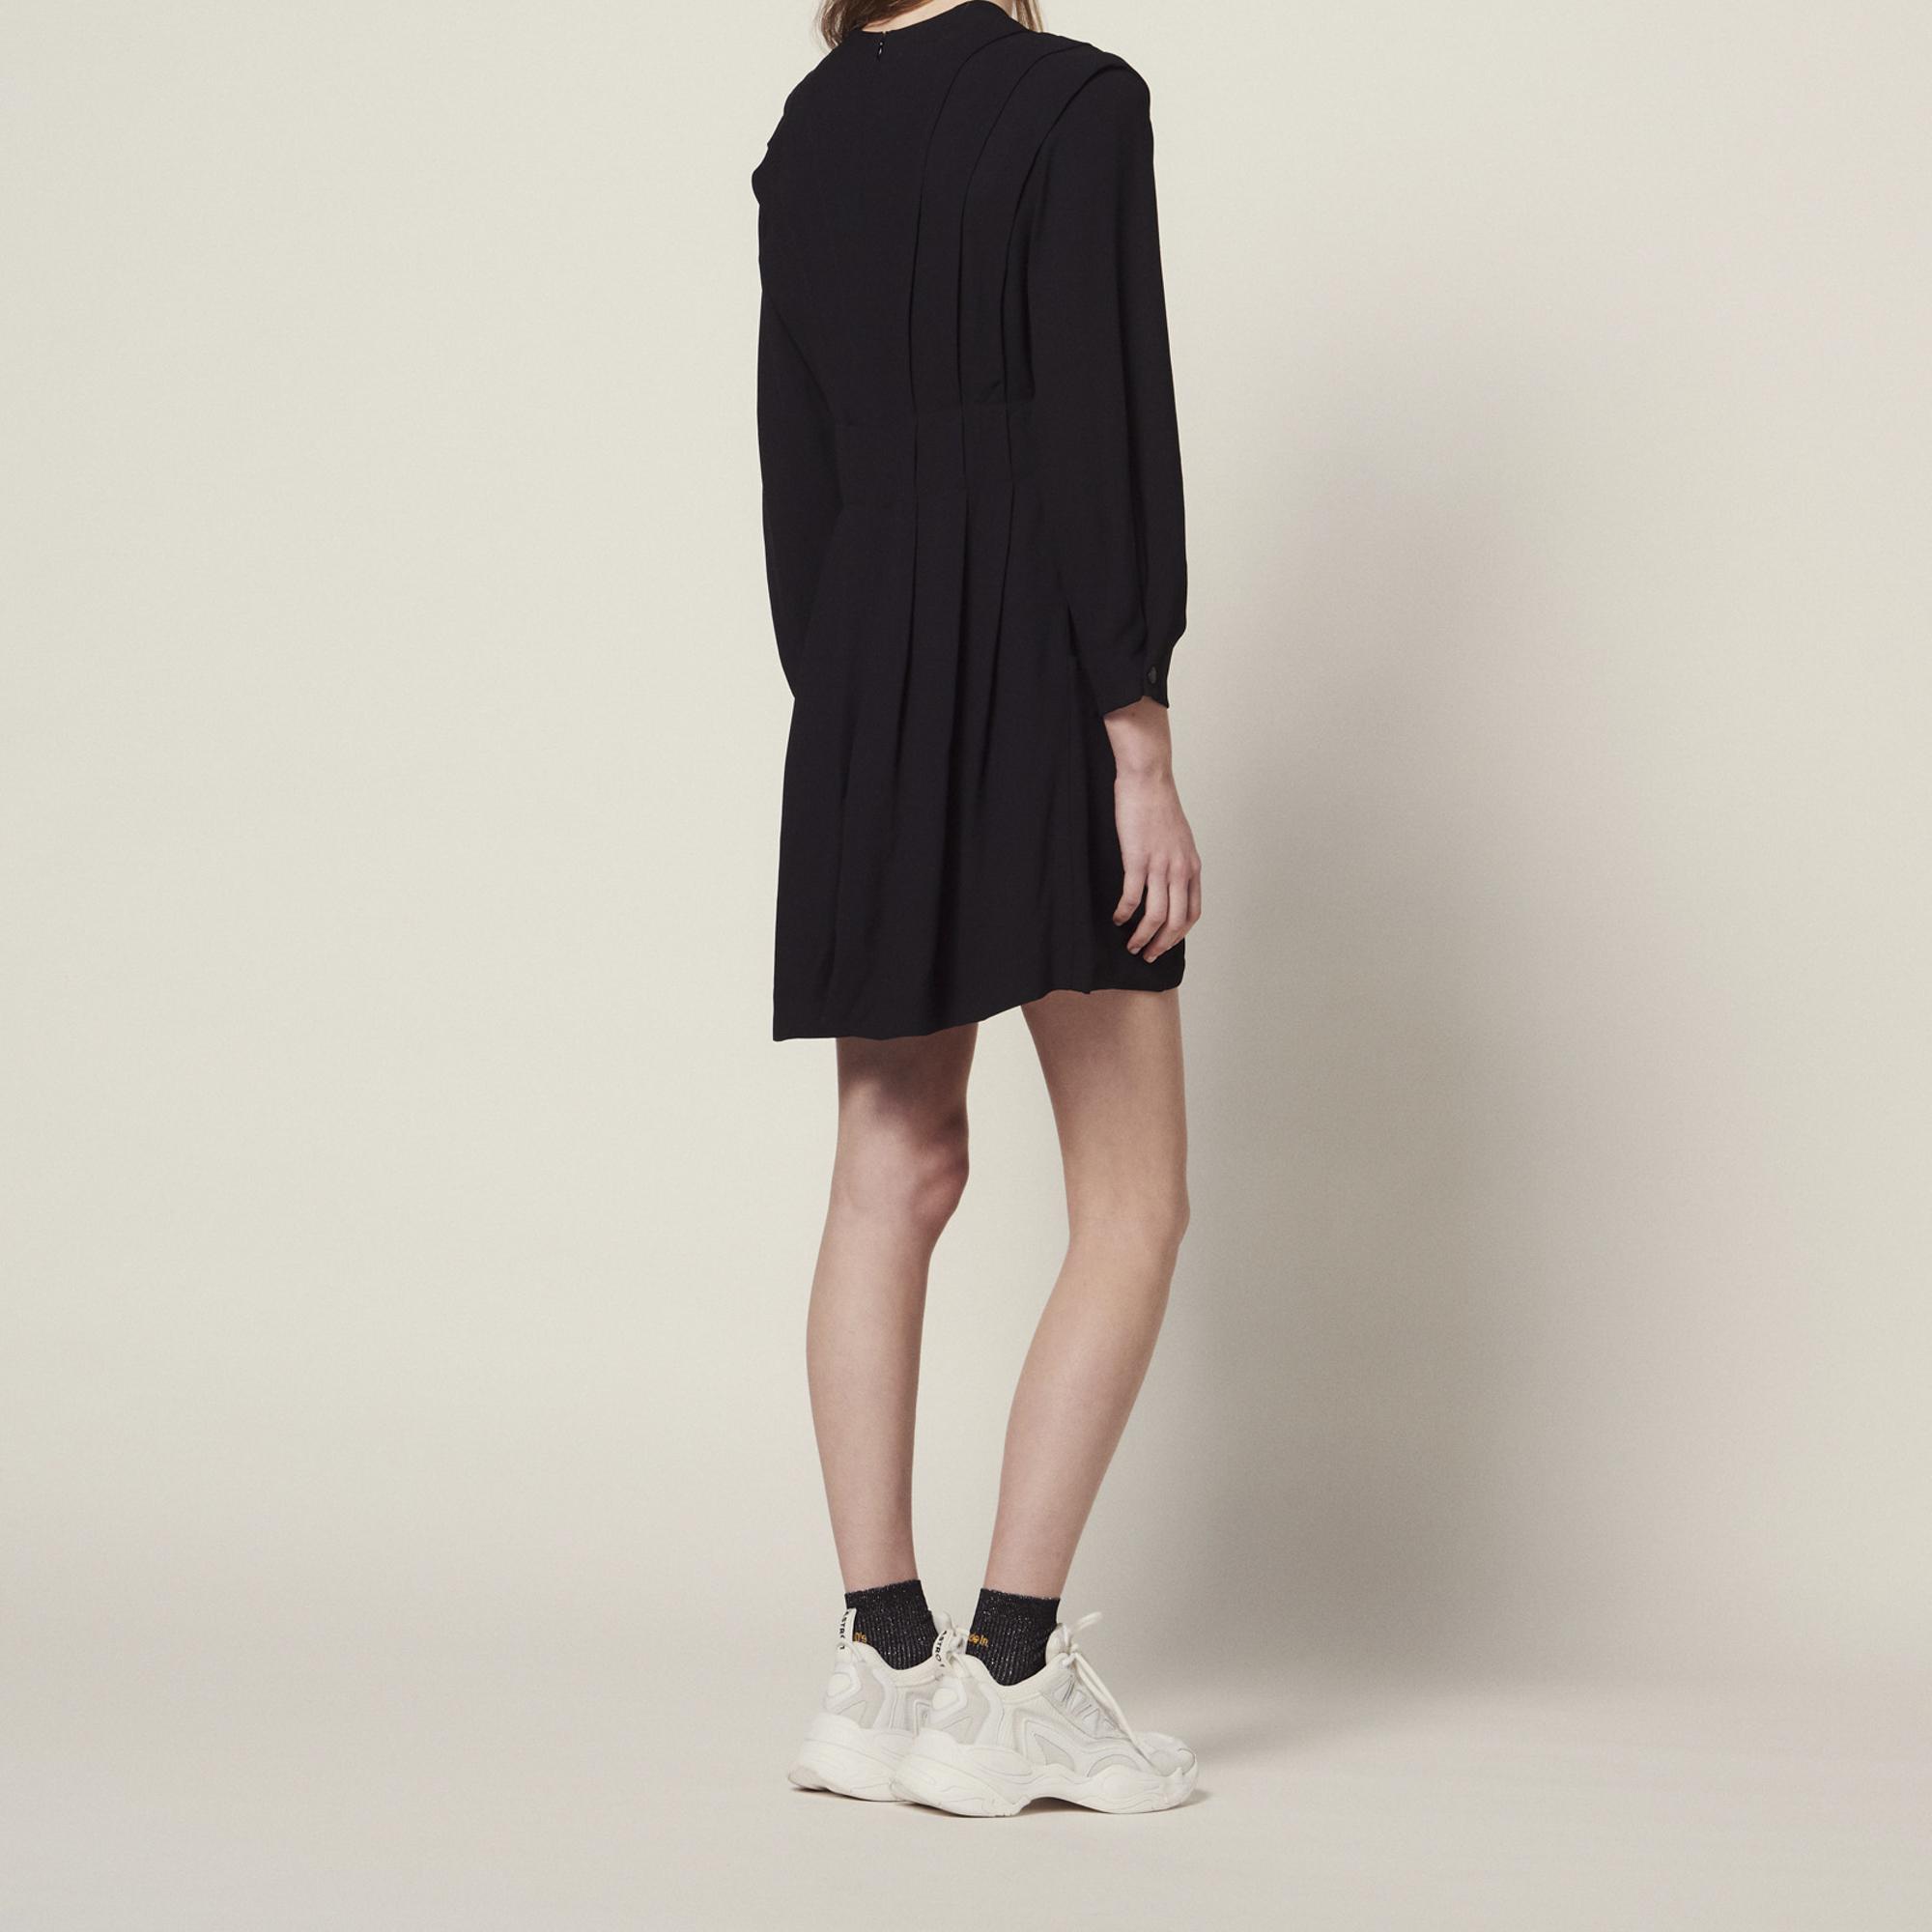 08a4f24728cf ... Short Flowing Dress With Pleats : Dresses color Black ...